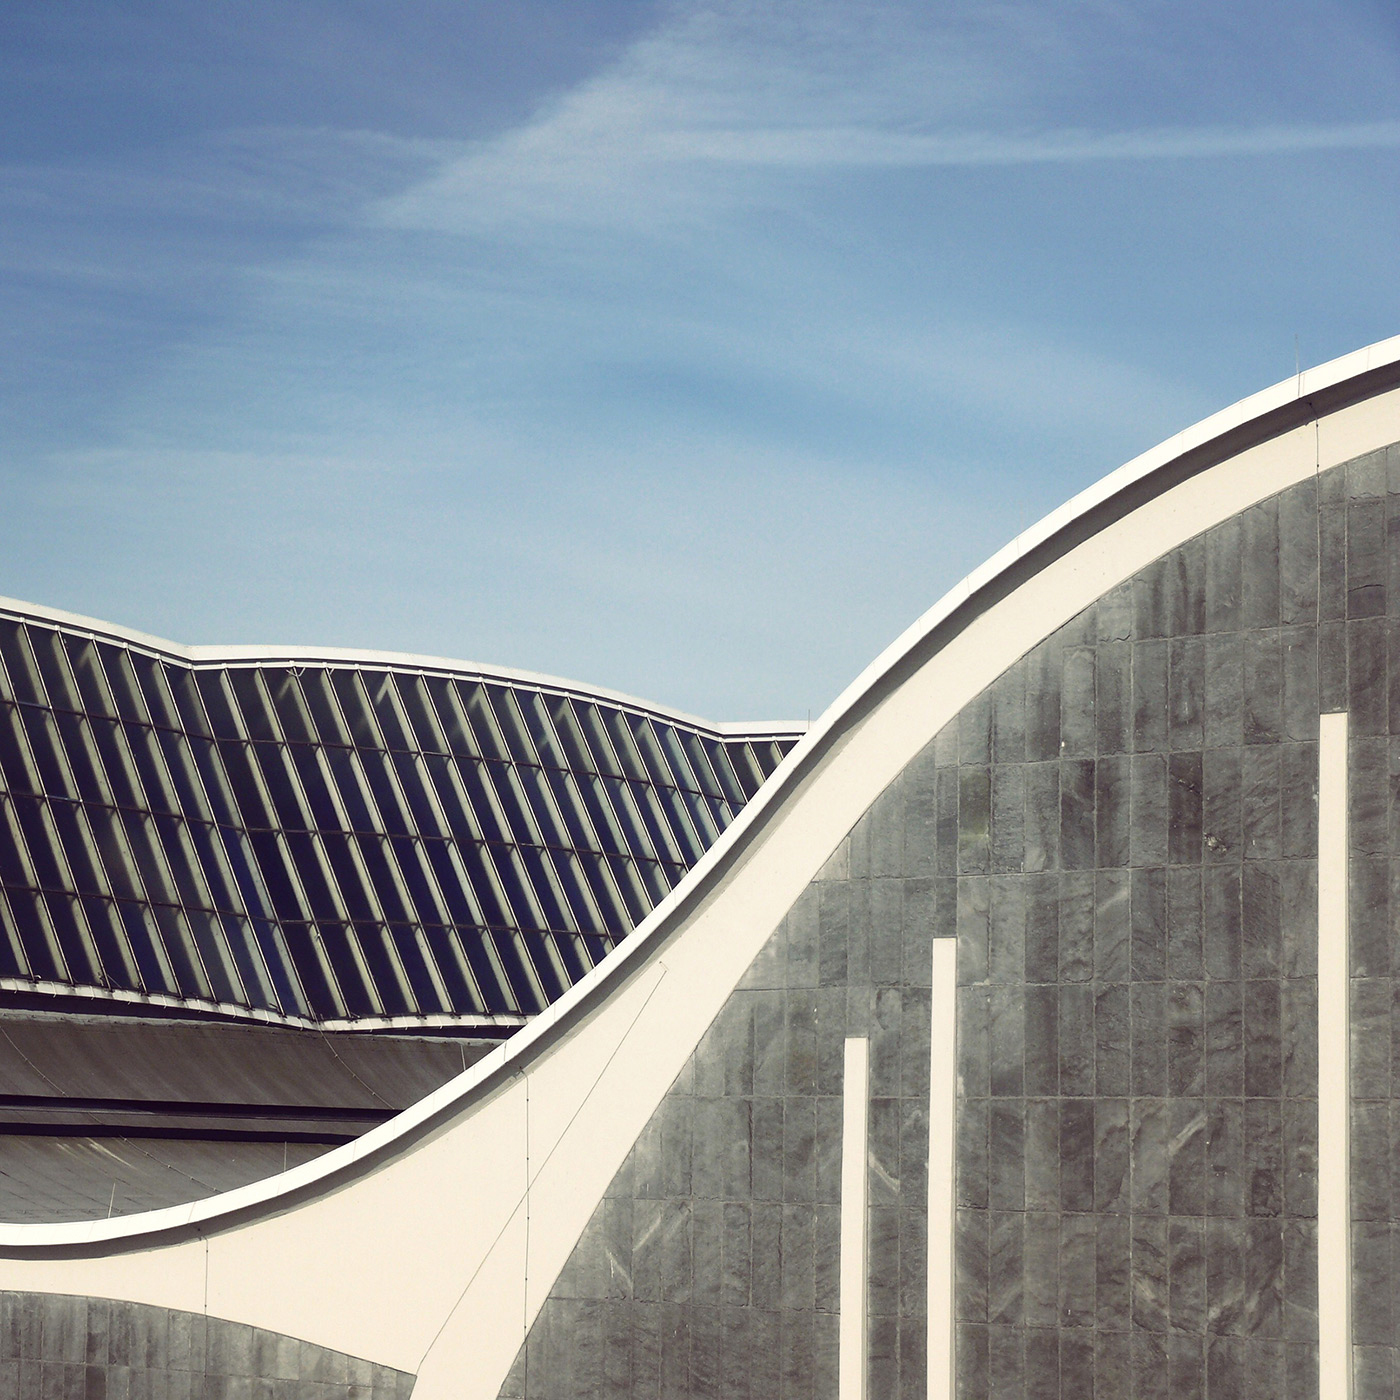 Wholesale Market <br />Location: Hamburg, Germany <br />Architects: Bernhard Hermkes